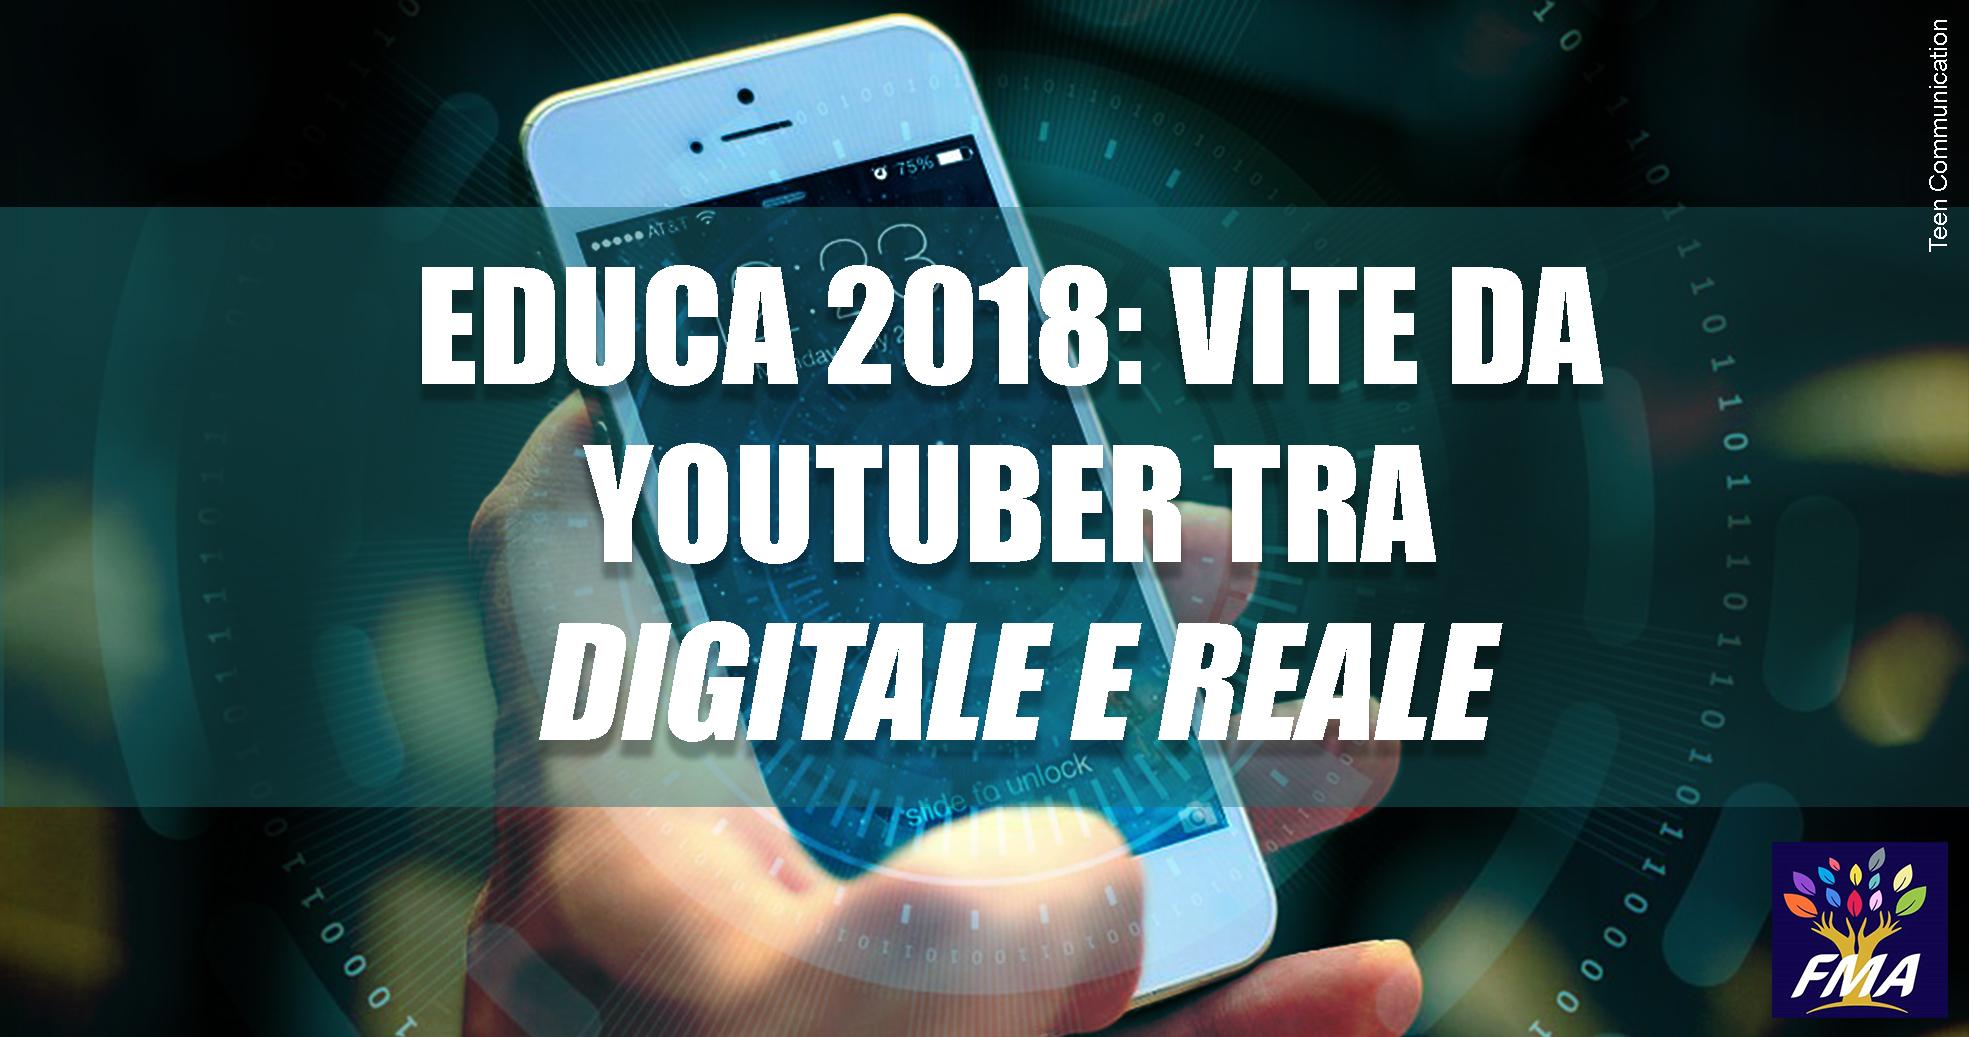 Educa 2018: vite da youtuber tra digitale e reale